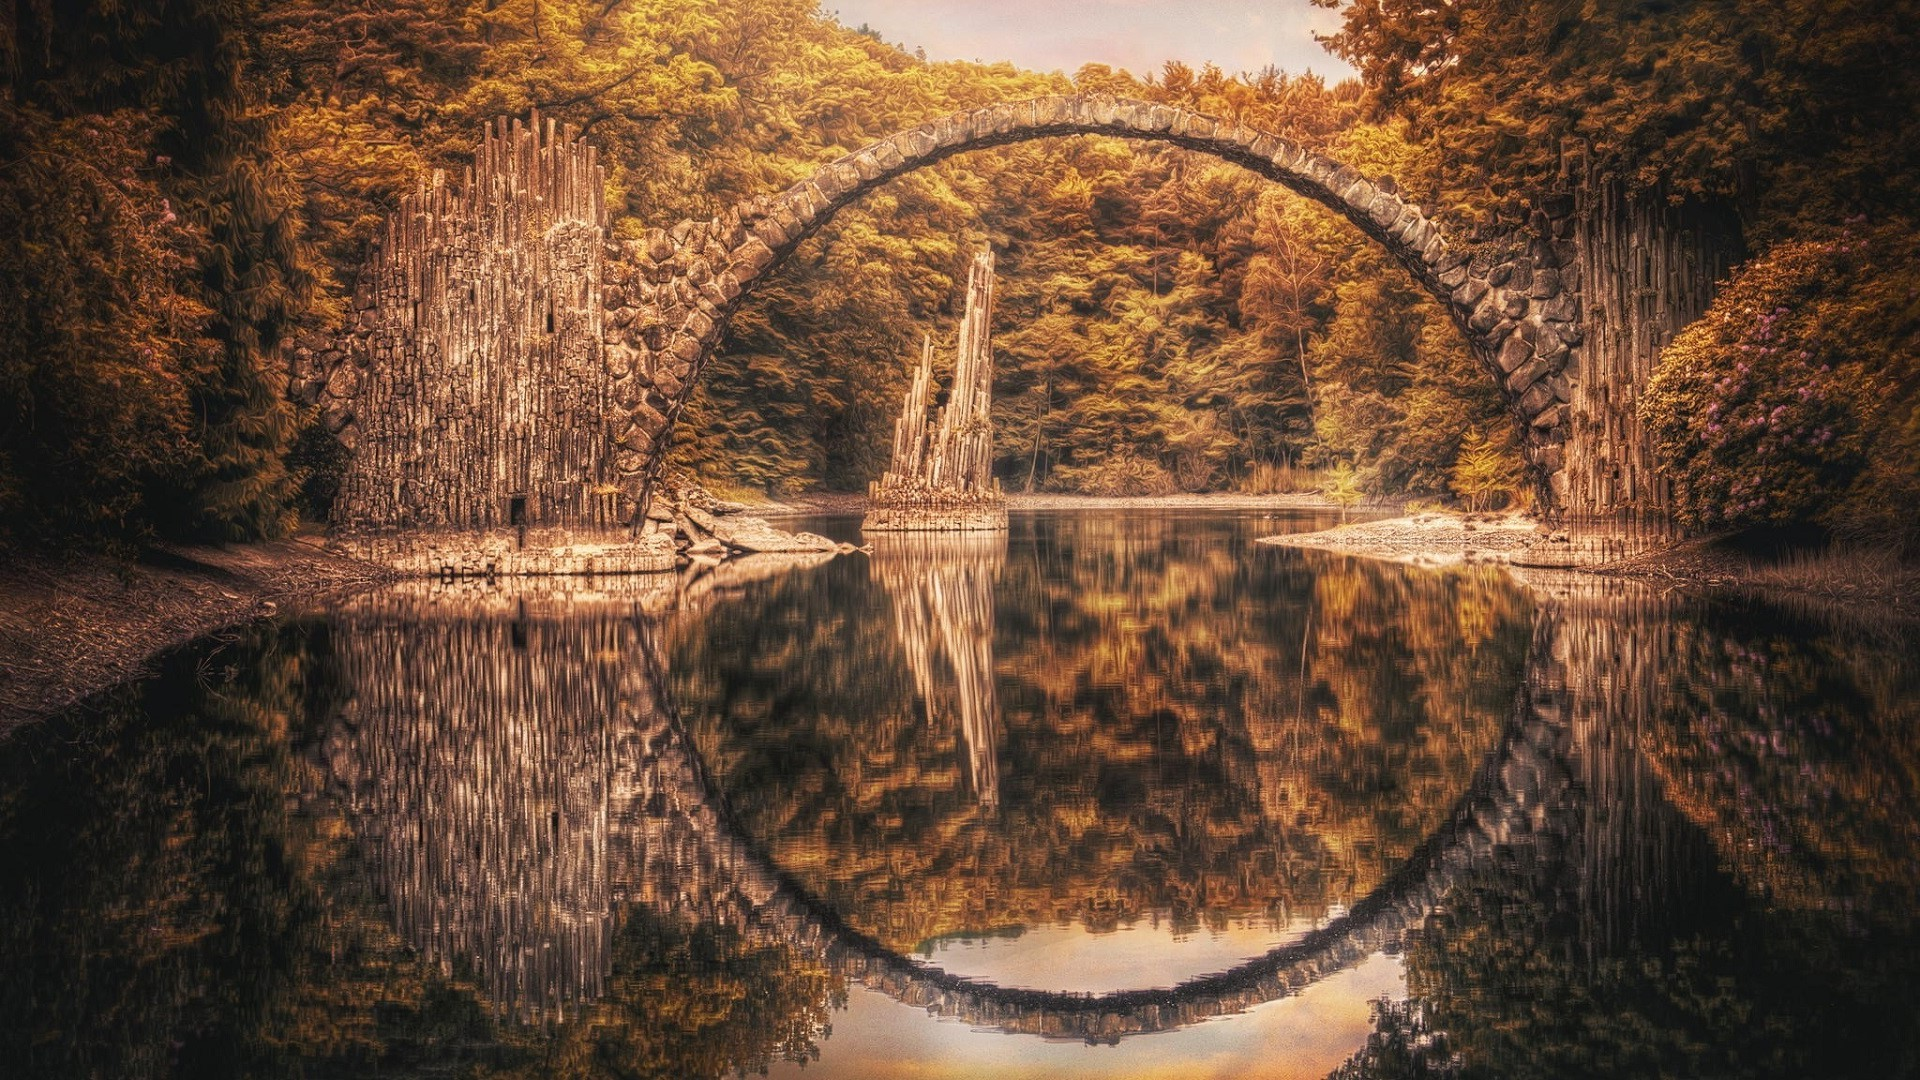 Gravity Falls Mobile Wallpaper Landscape Hdr Reflection Nature Bridge Rock Formation